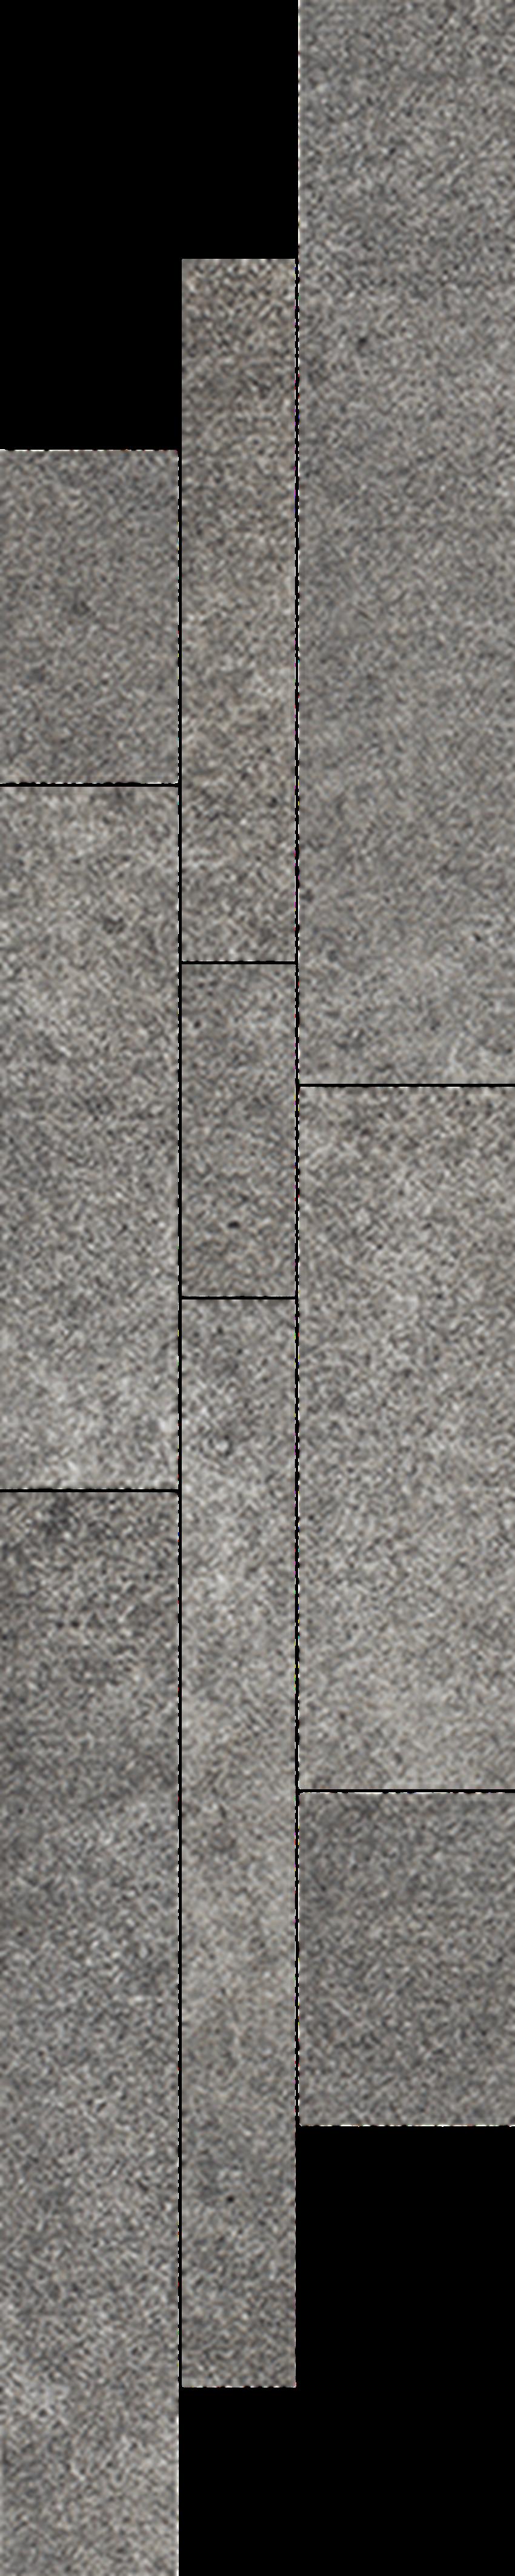 Listwa 14,3x71 cm Paradyż Riversand Grafit Listwa Mix Paski